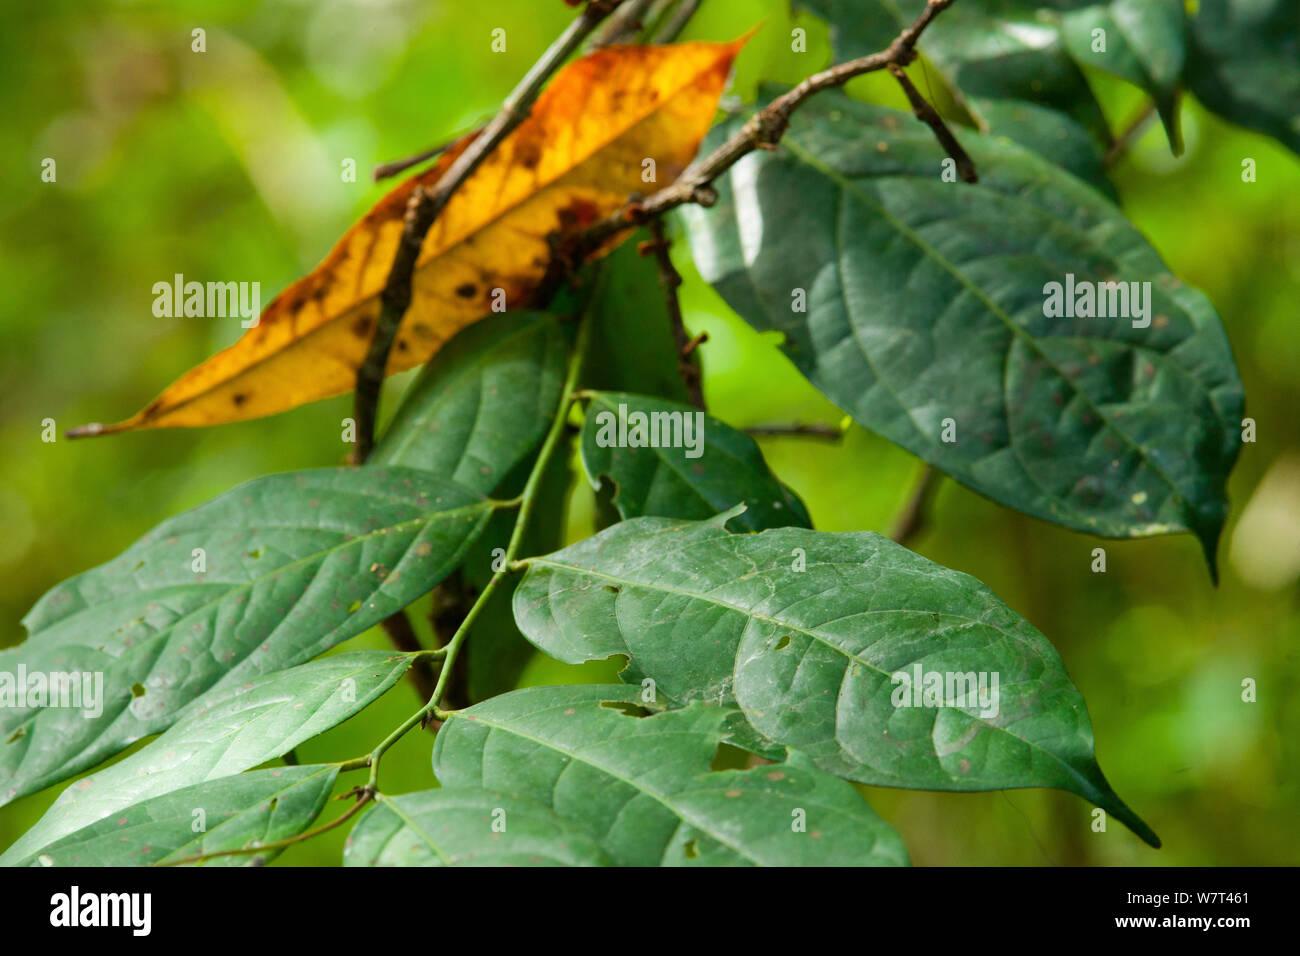 Babango (Diospyros bipindensis or Diospyros iturensis) tree  leaves, food plant for many primates including Gorillas and Chimpanzees, Bai Hokou, Dzanga-Ndoki National Park, Central African Republic. Stock Photo